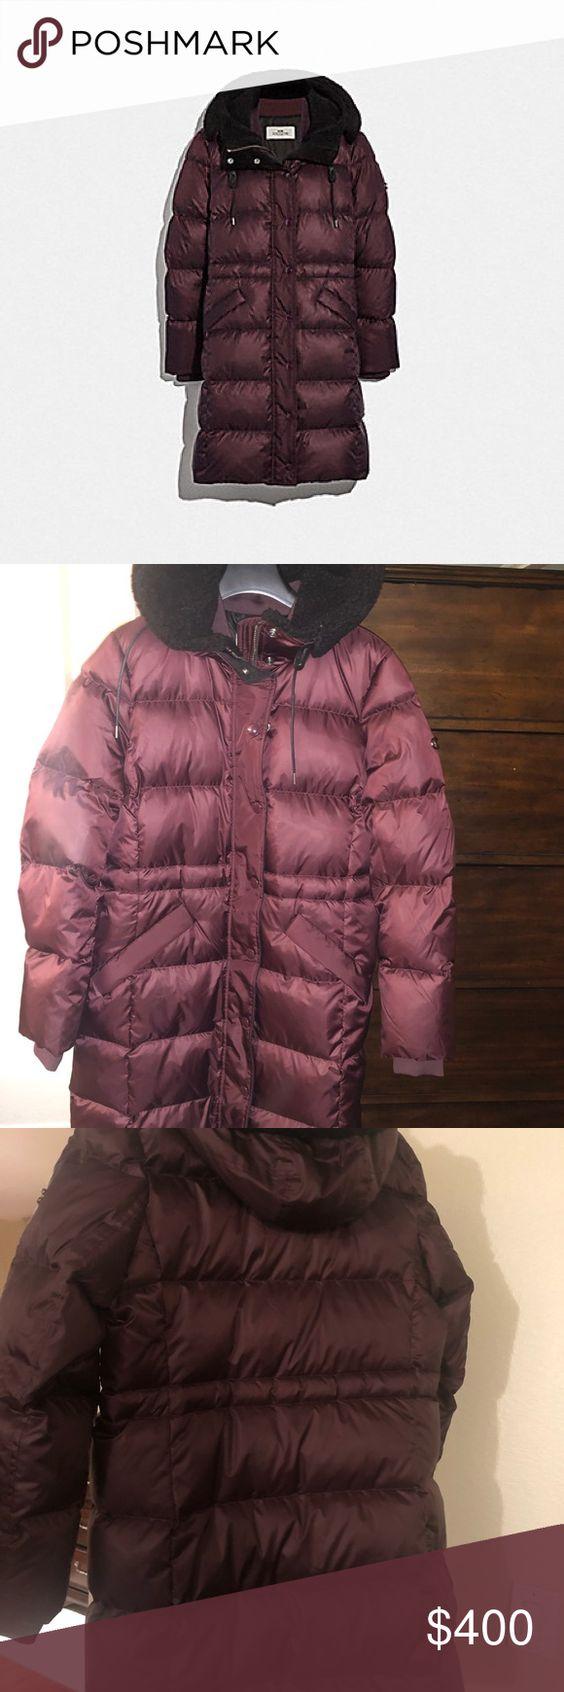 Coach Long Puffer Jacket Long Puffer Jacket Clothes Design Fashion [ 1692 x 564 Pixel ]